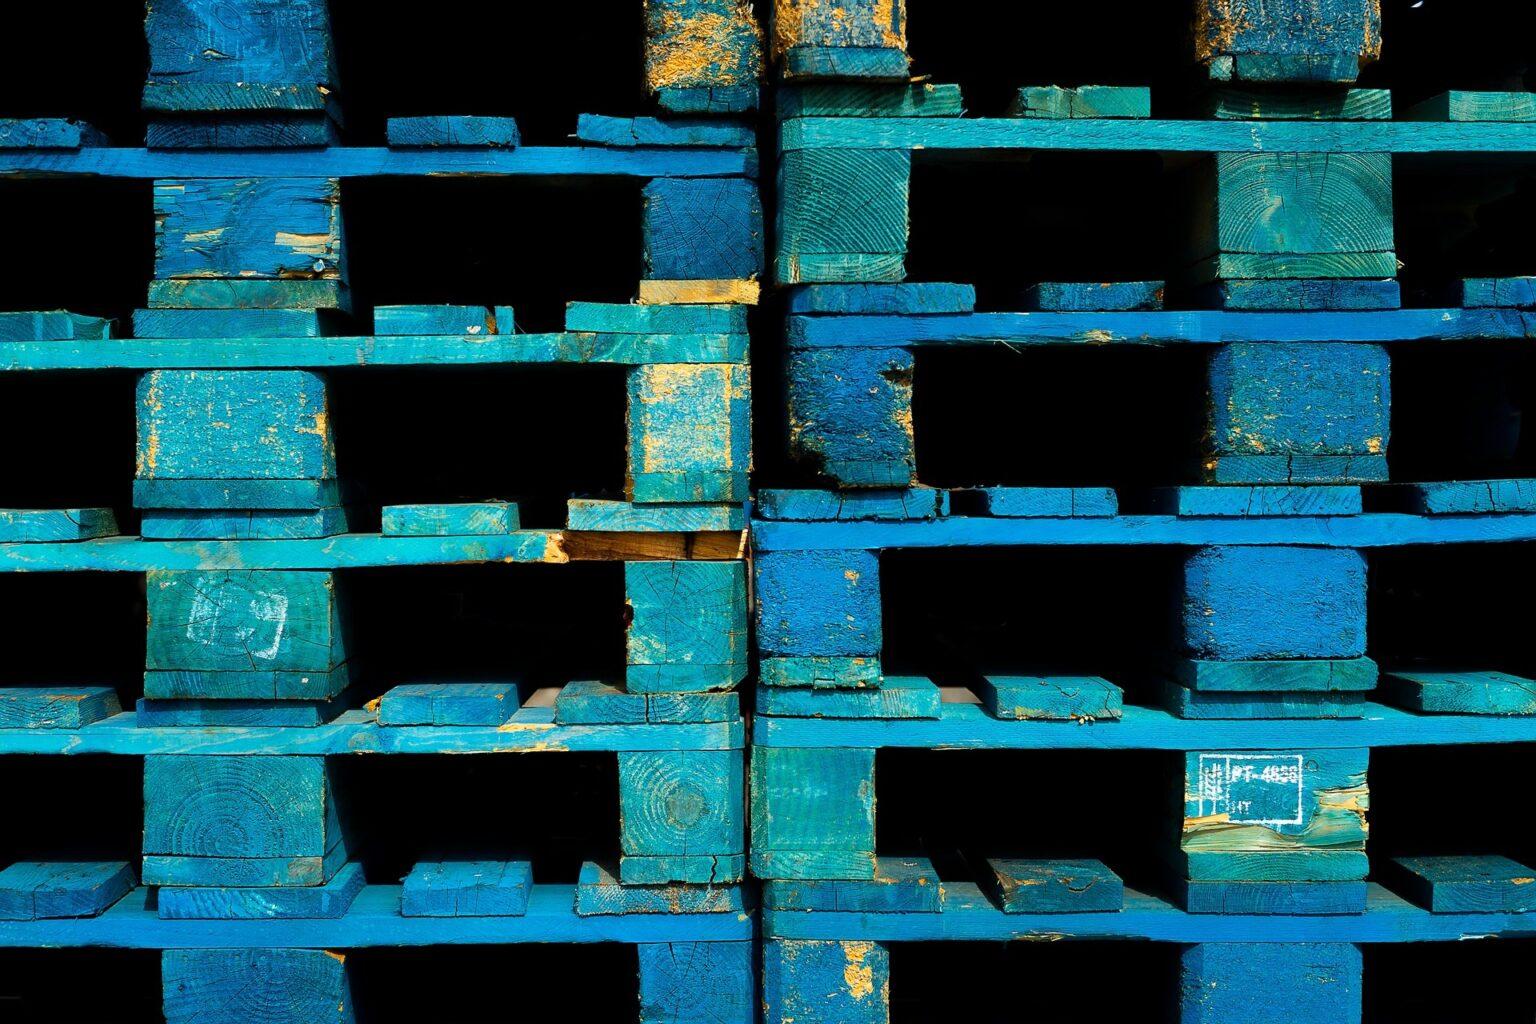 wood-pallets-g2a4ba5d60_1920